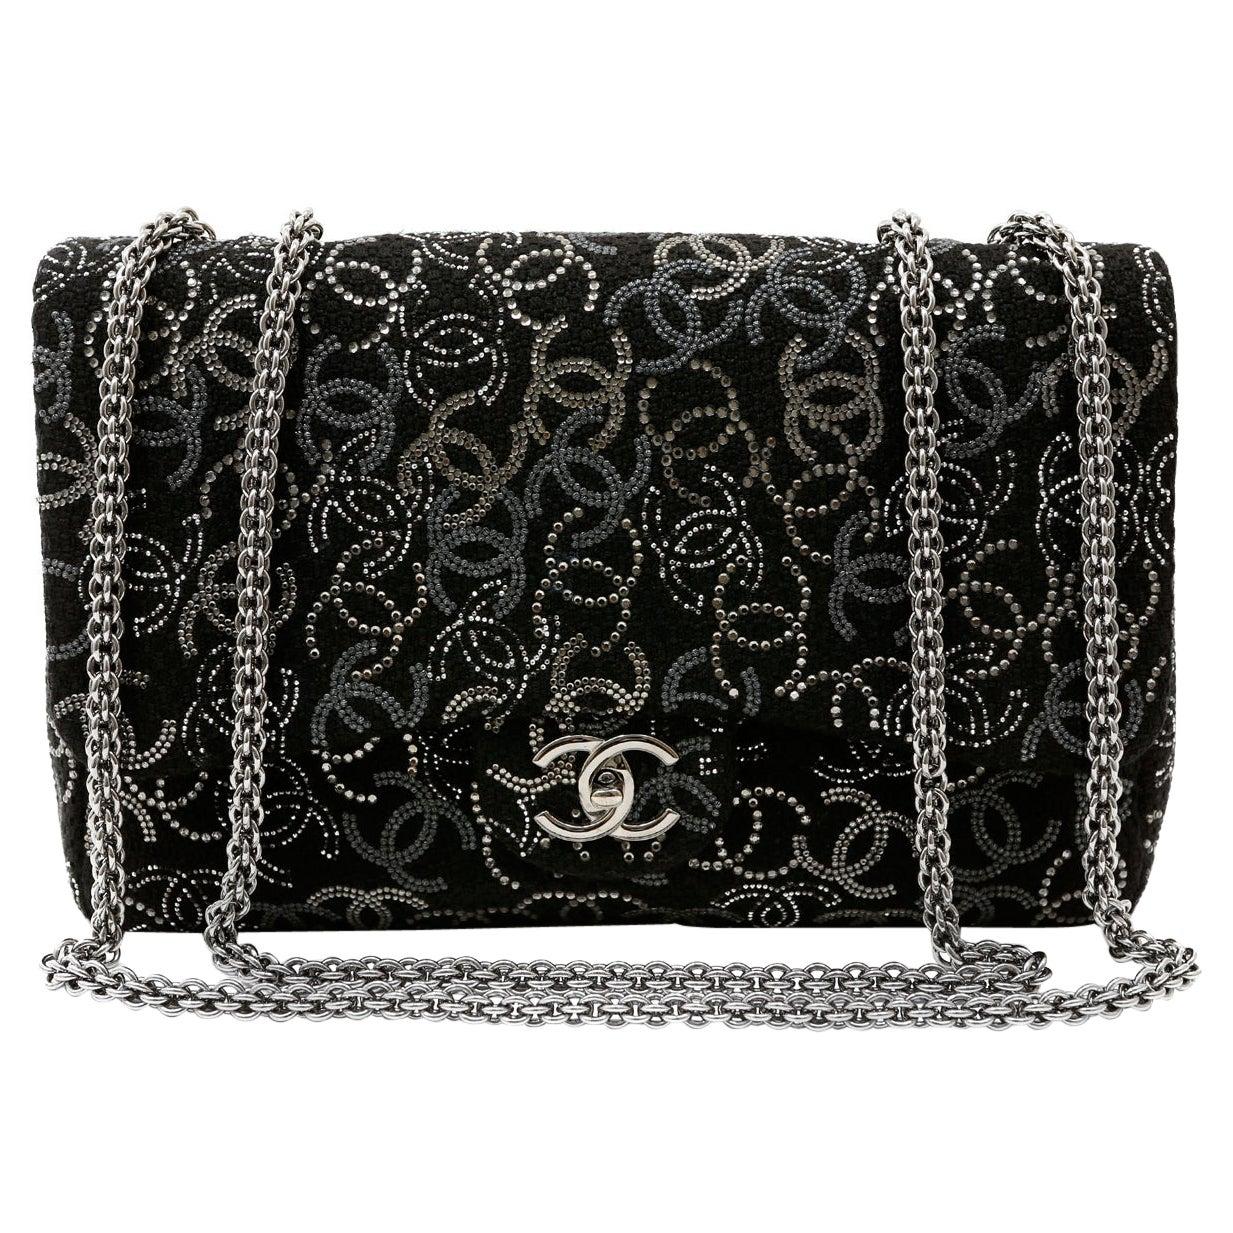 Chanel Black Tweed Swarovski Crystal Jumbo Classic Bag